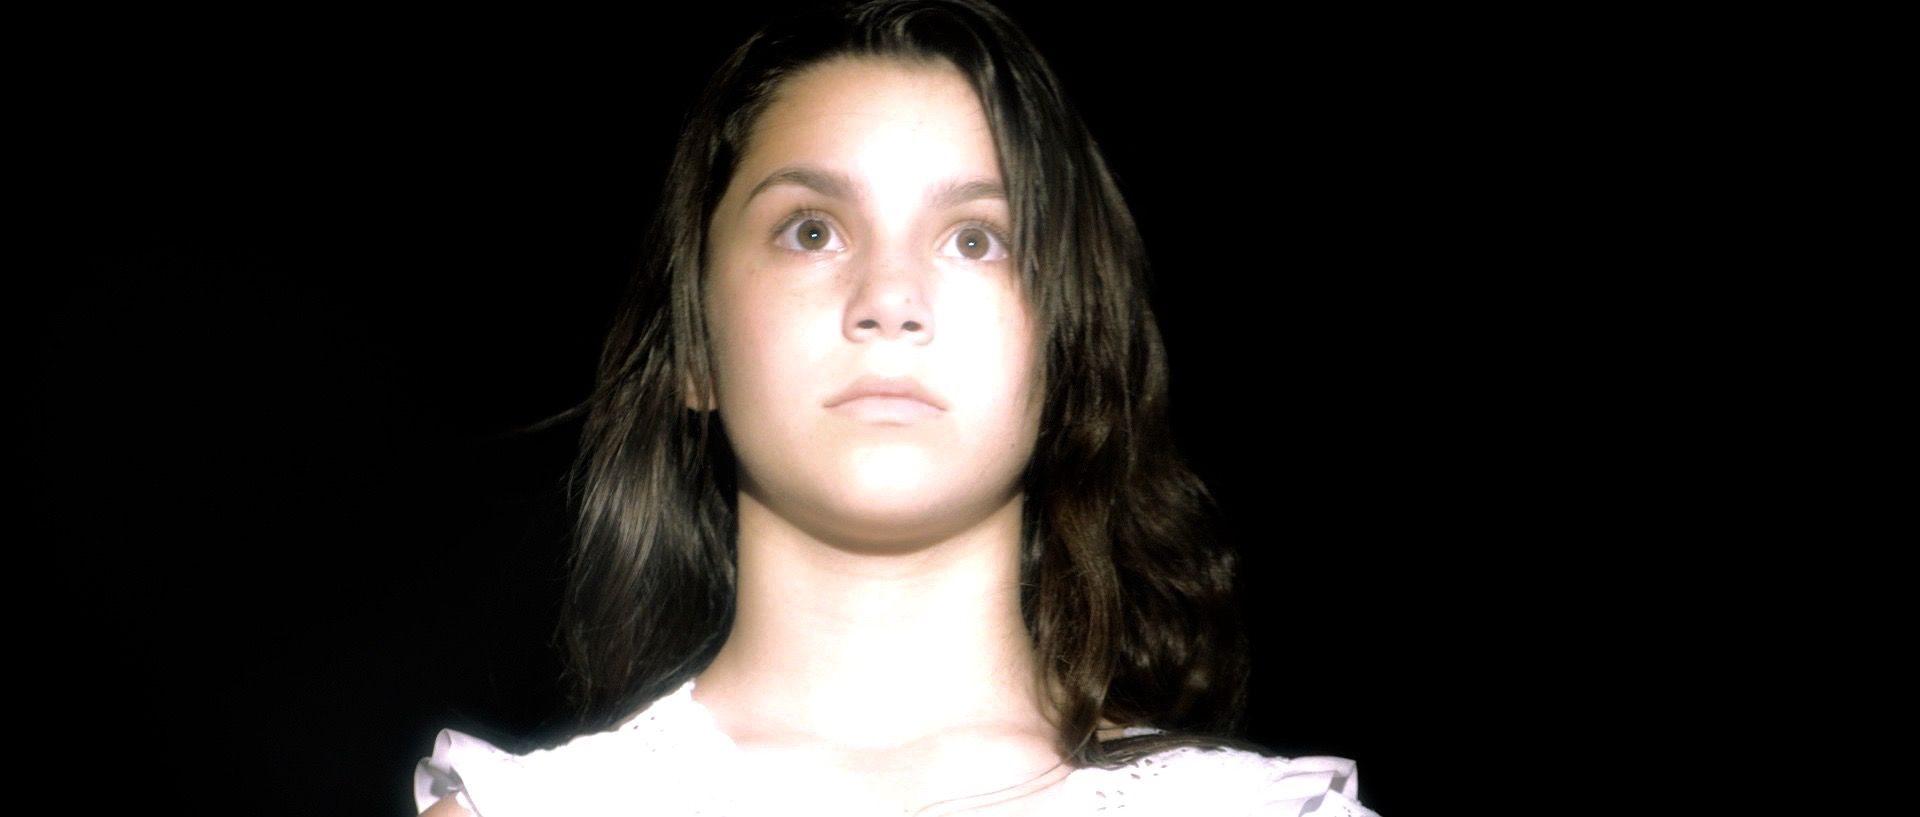 Mira (Paeka Campos) enters her own dream.